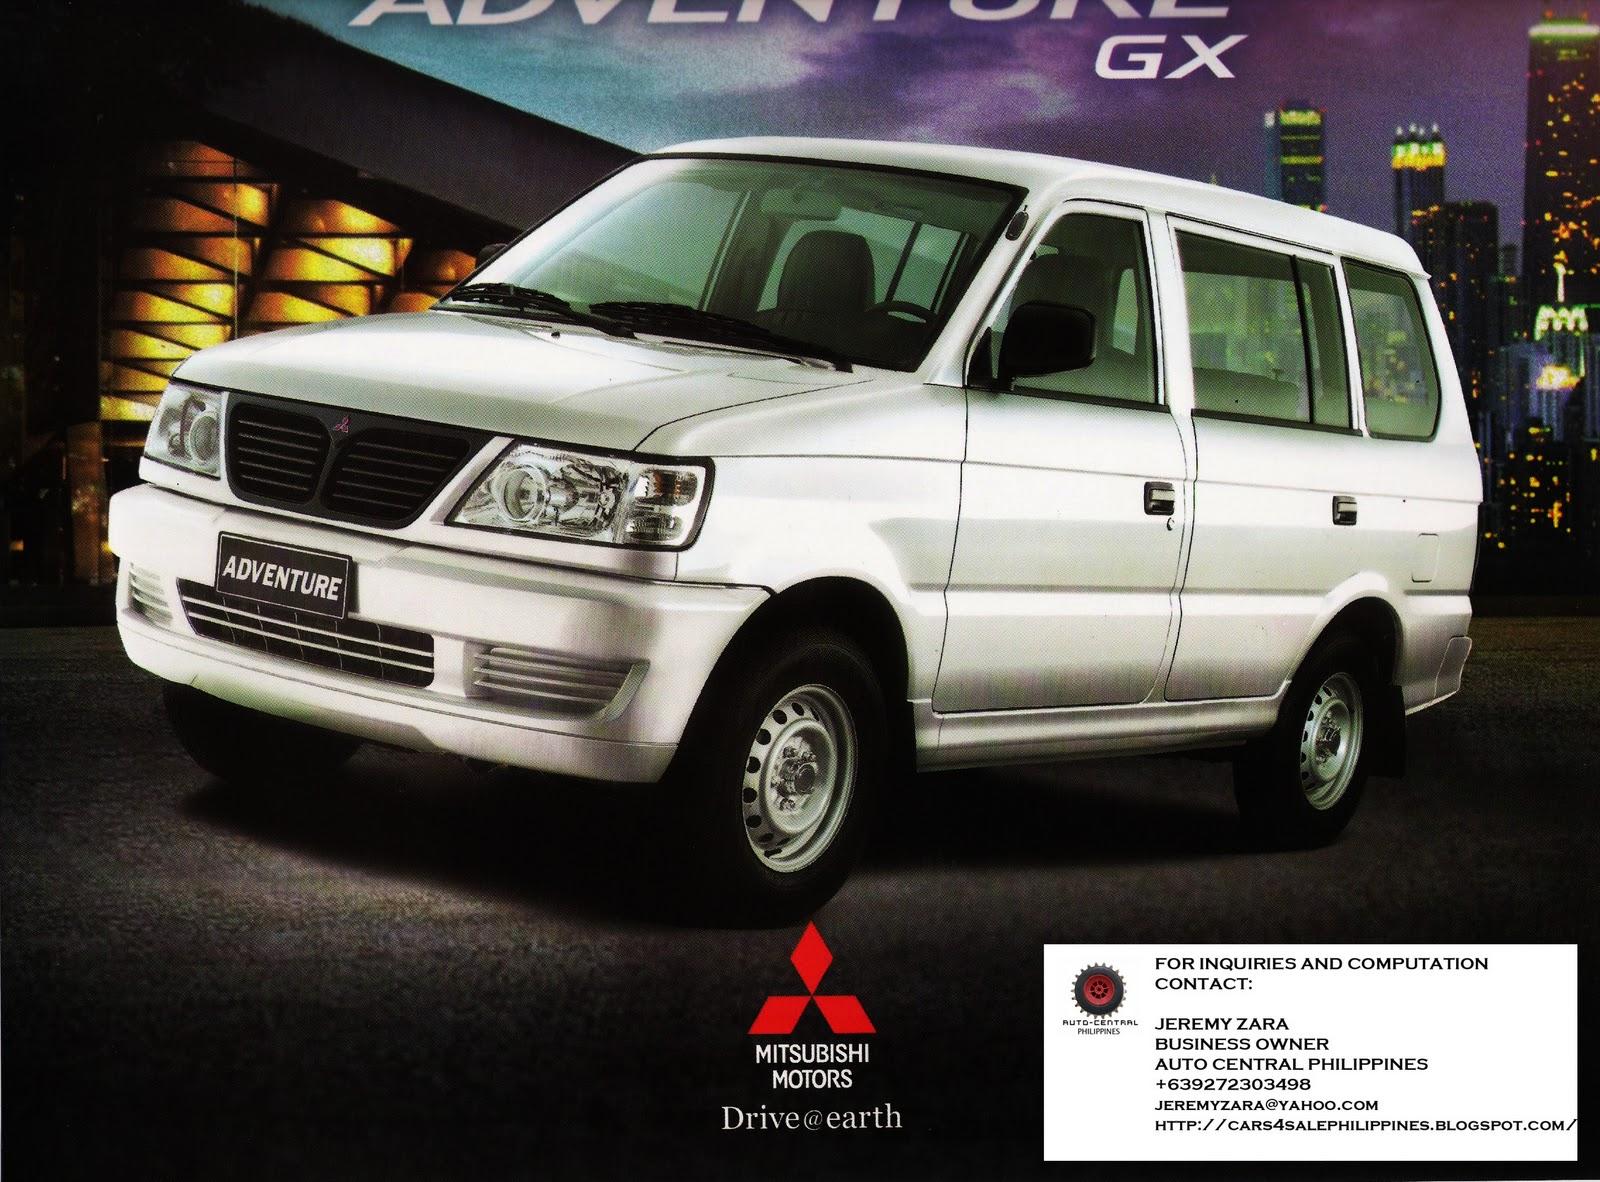 Adventure Car: Brand New Cars For Sale: BRAND NEW MITSUBISHI ADVENTURE